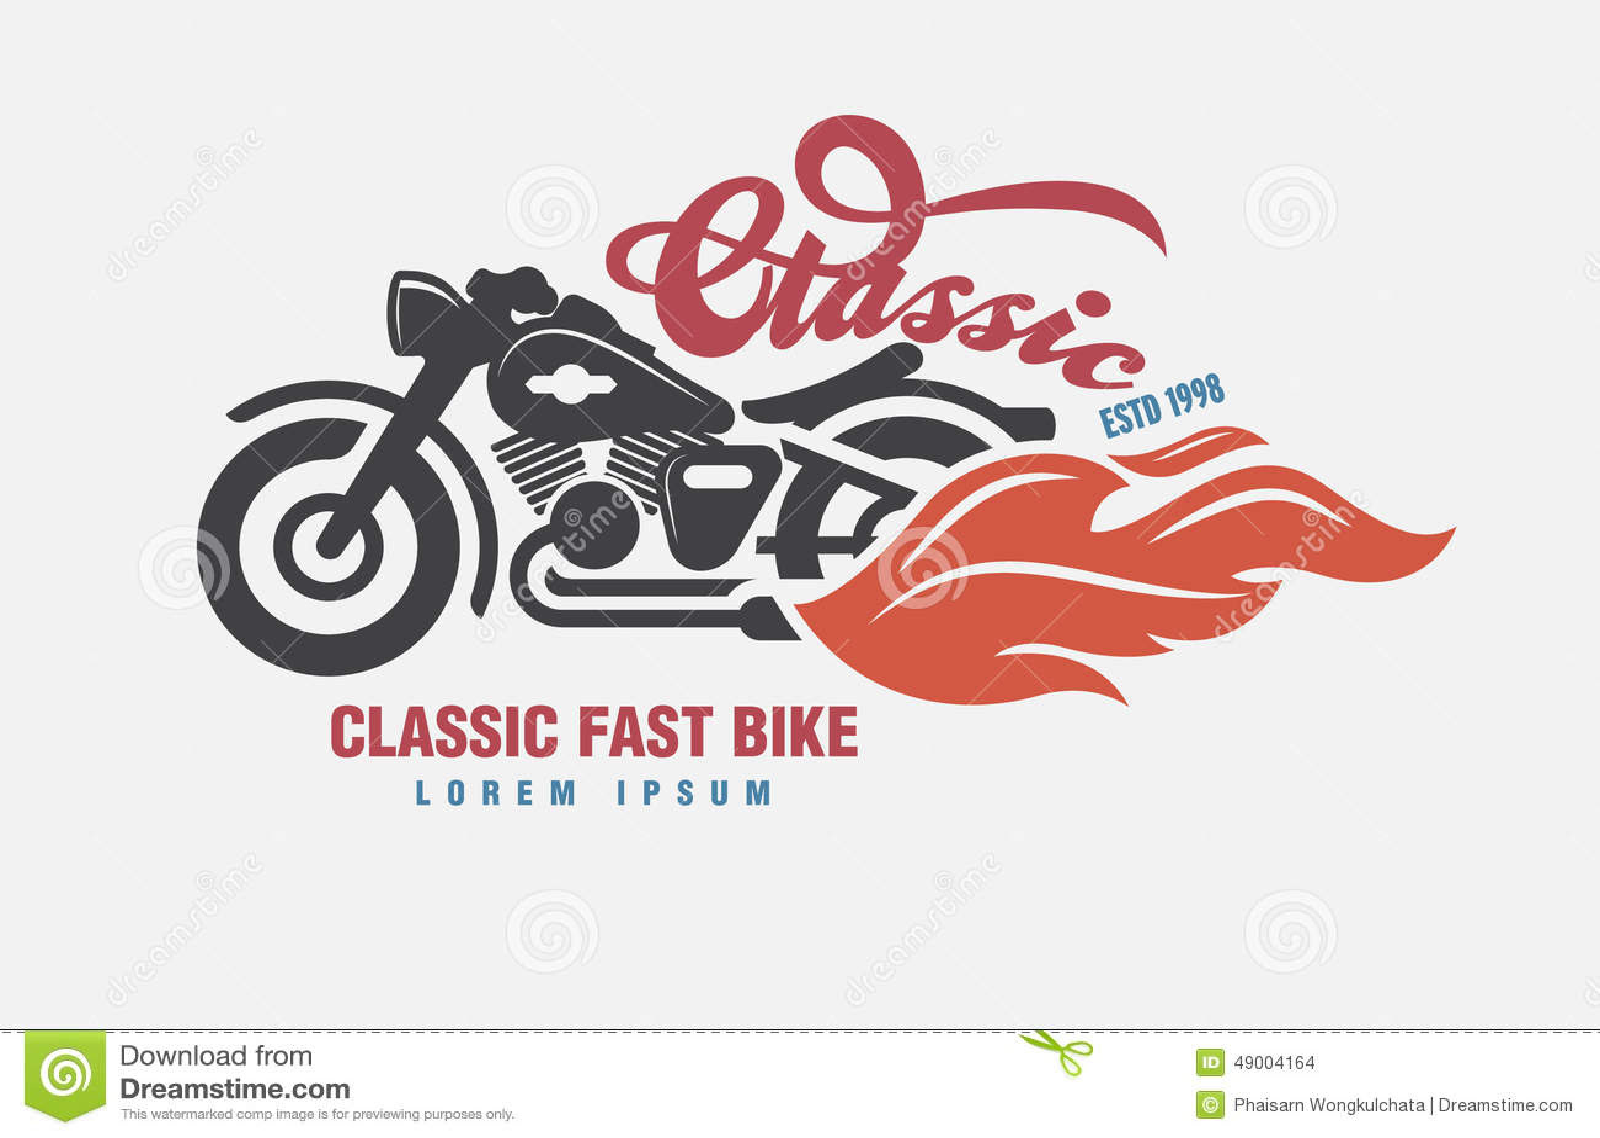 Logo Motor Club . Stock Vector - Image: 49004164